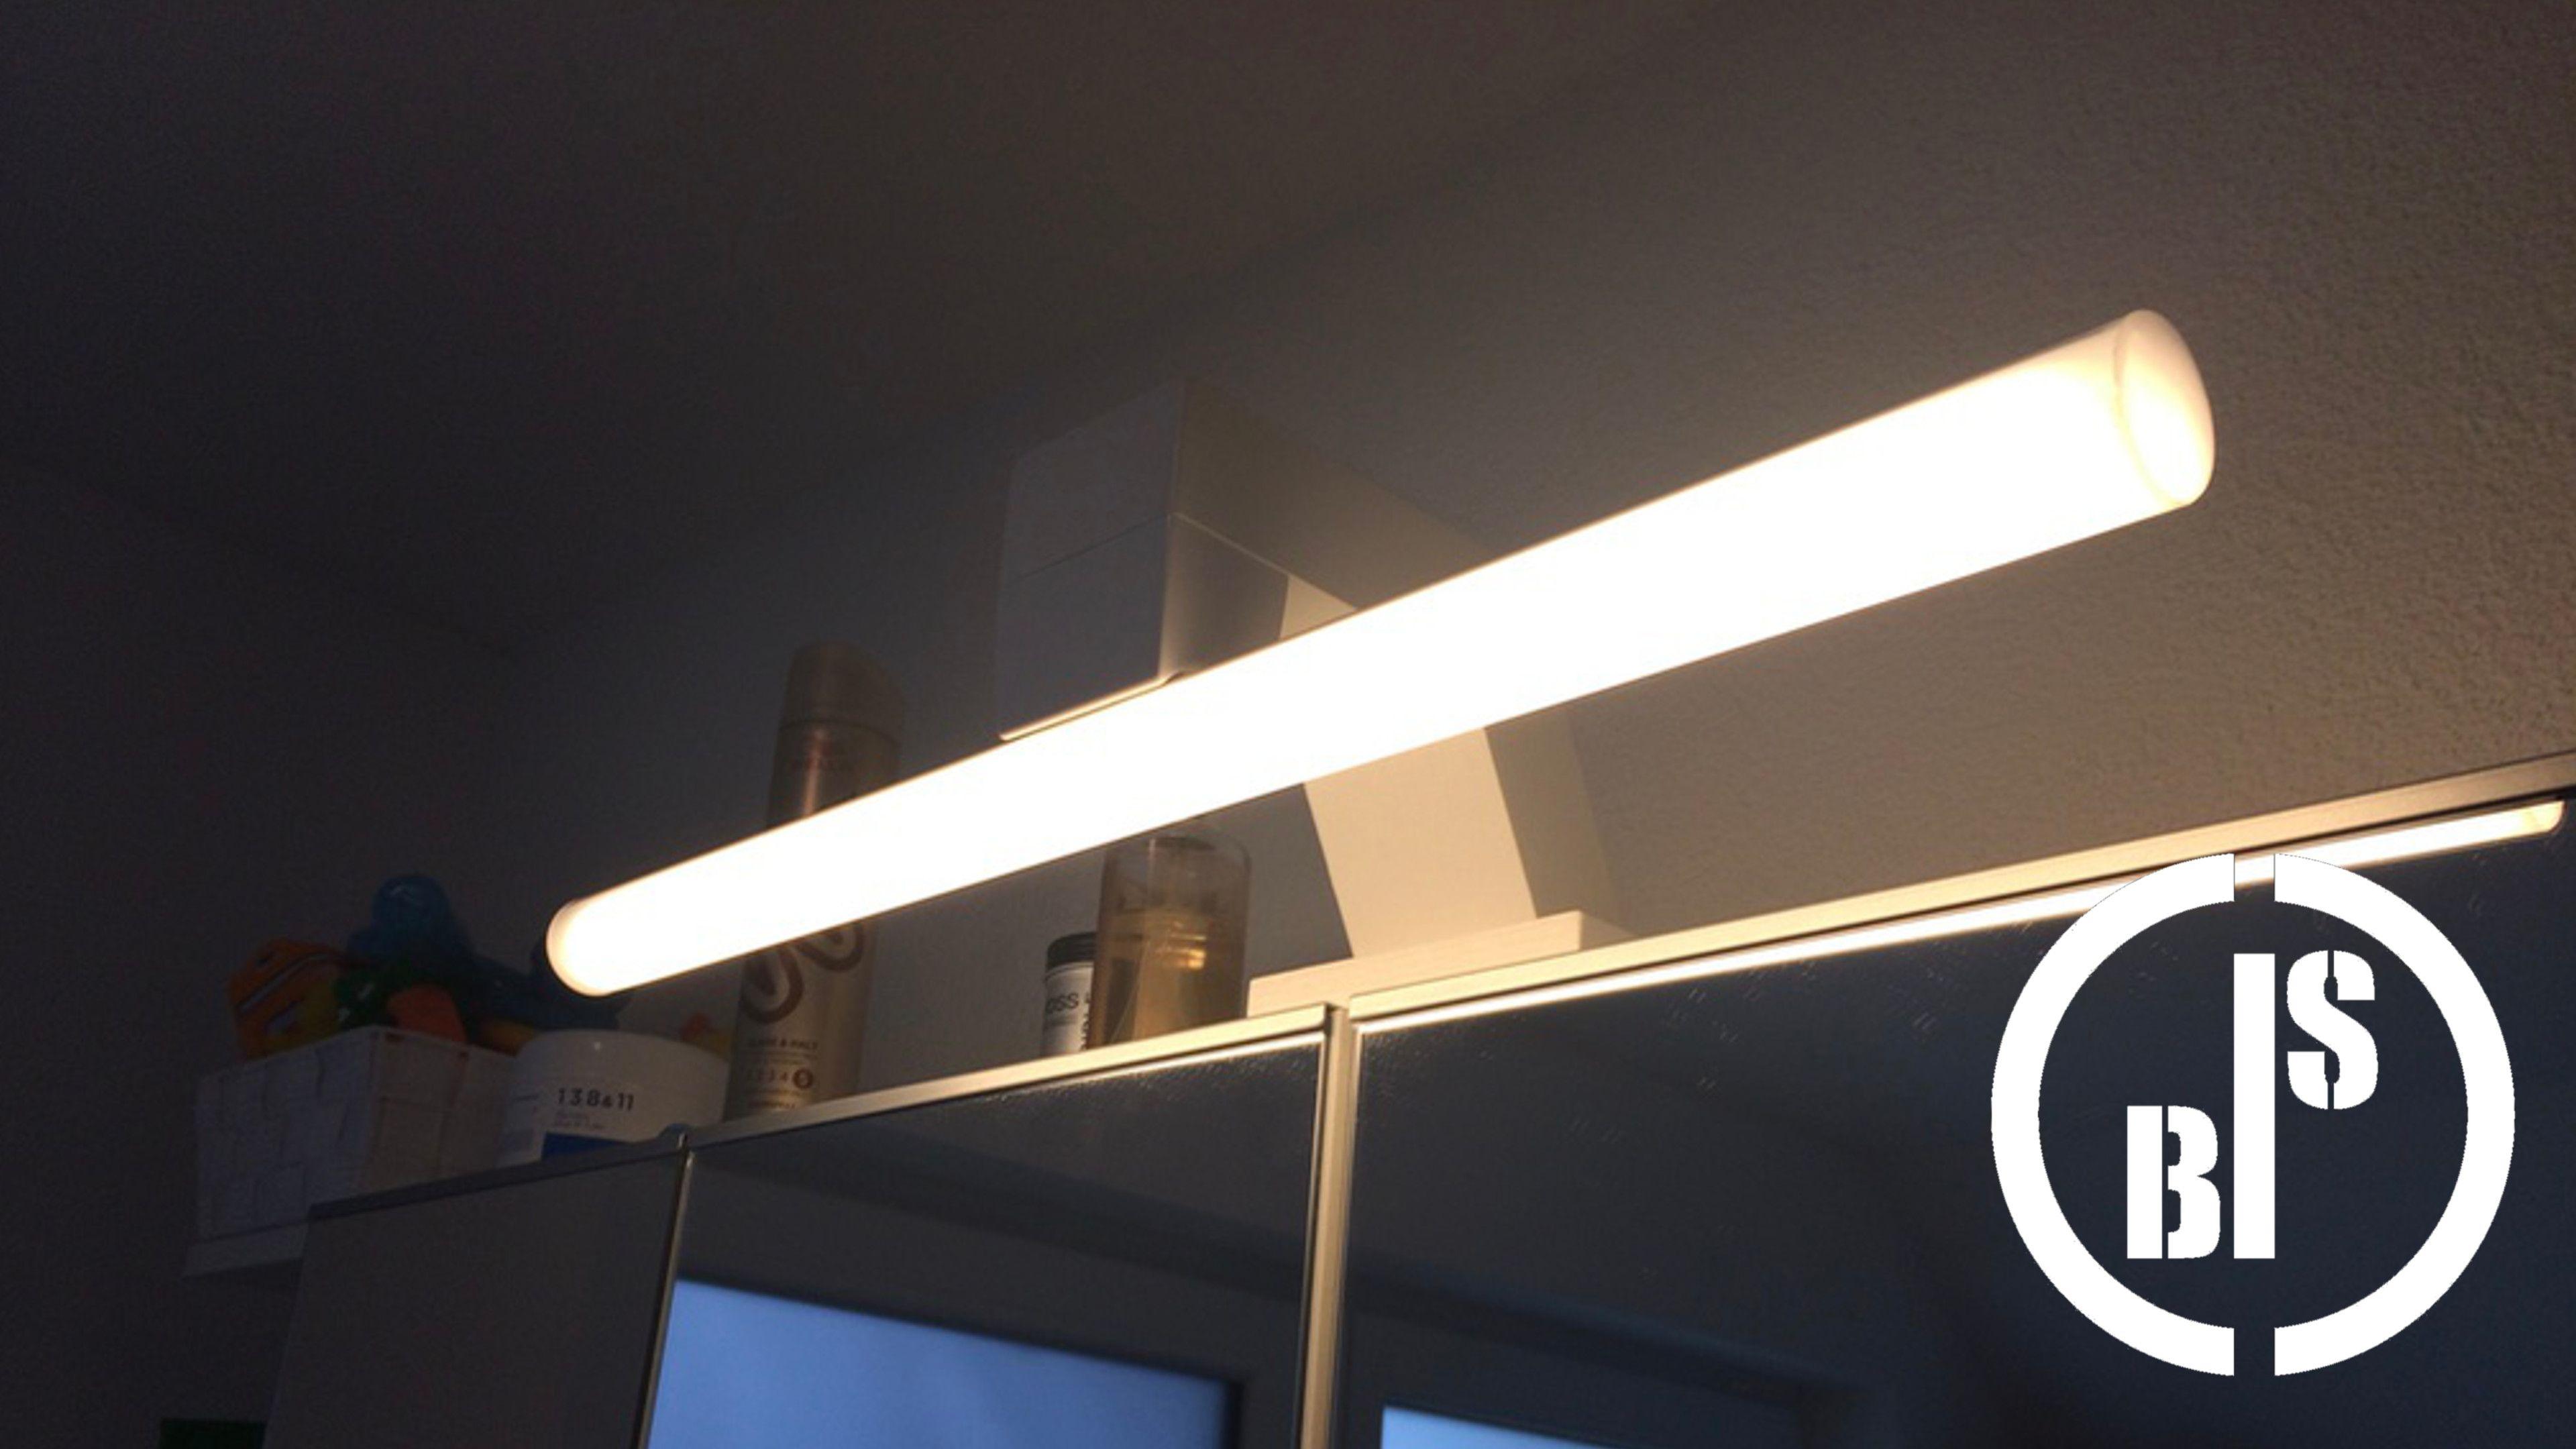 Diy Bathroom Light Badezimmer Lampe Selber Bauen Because We Didn